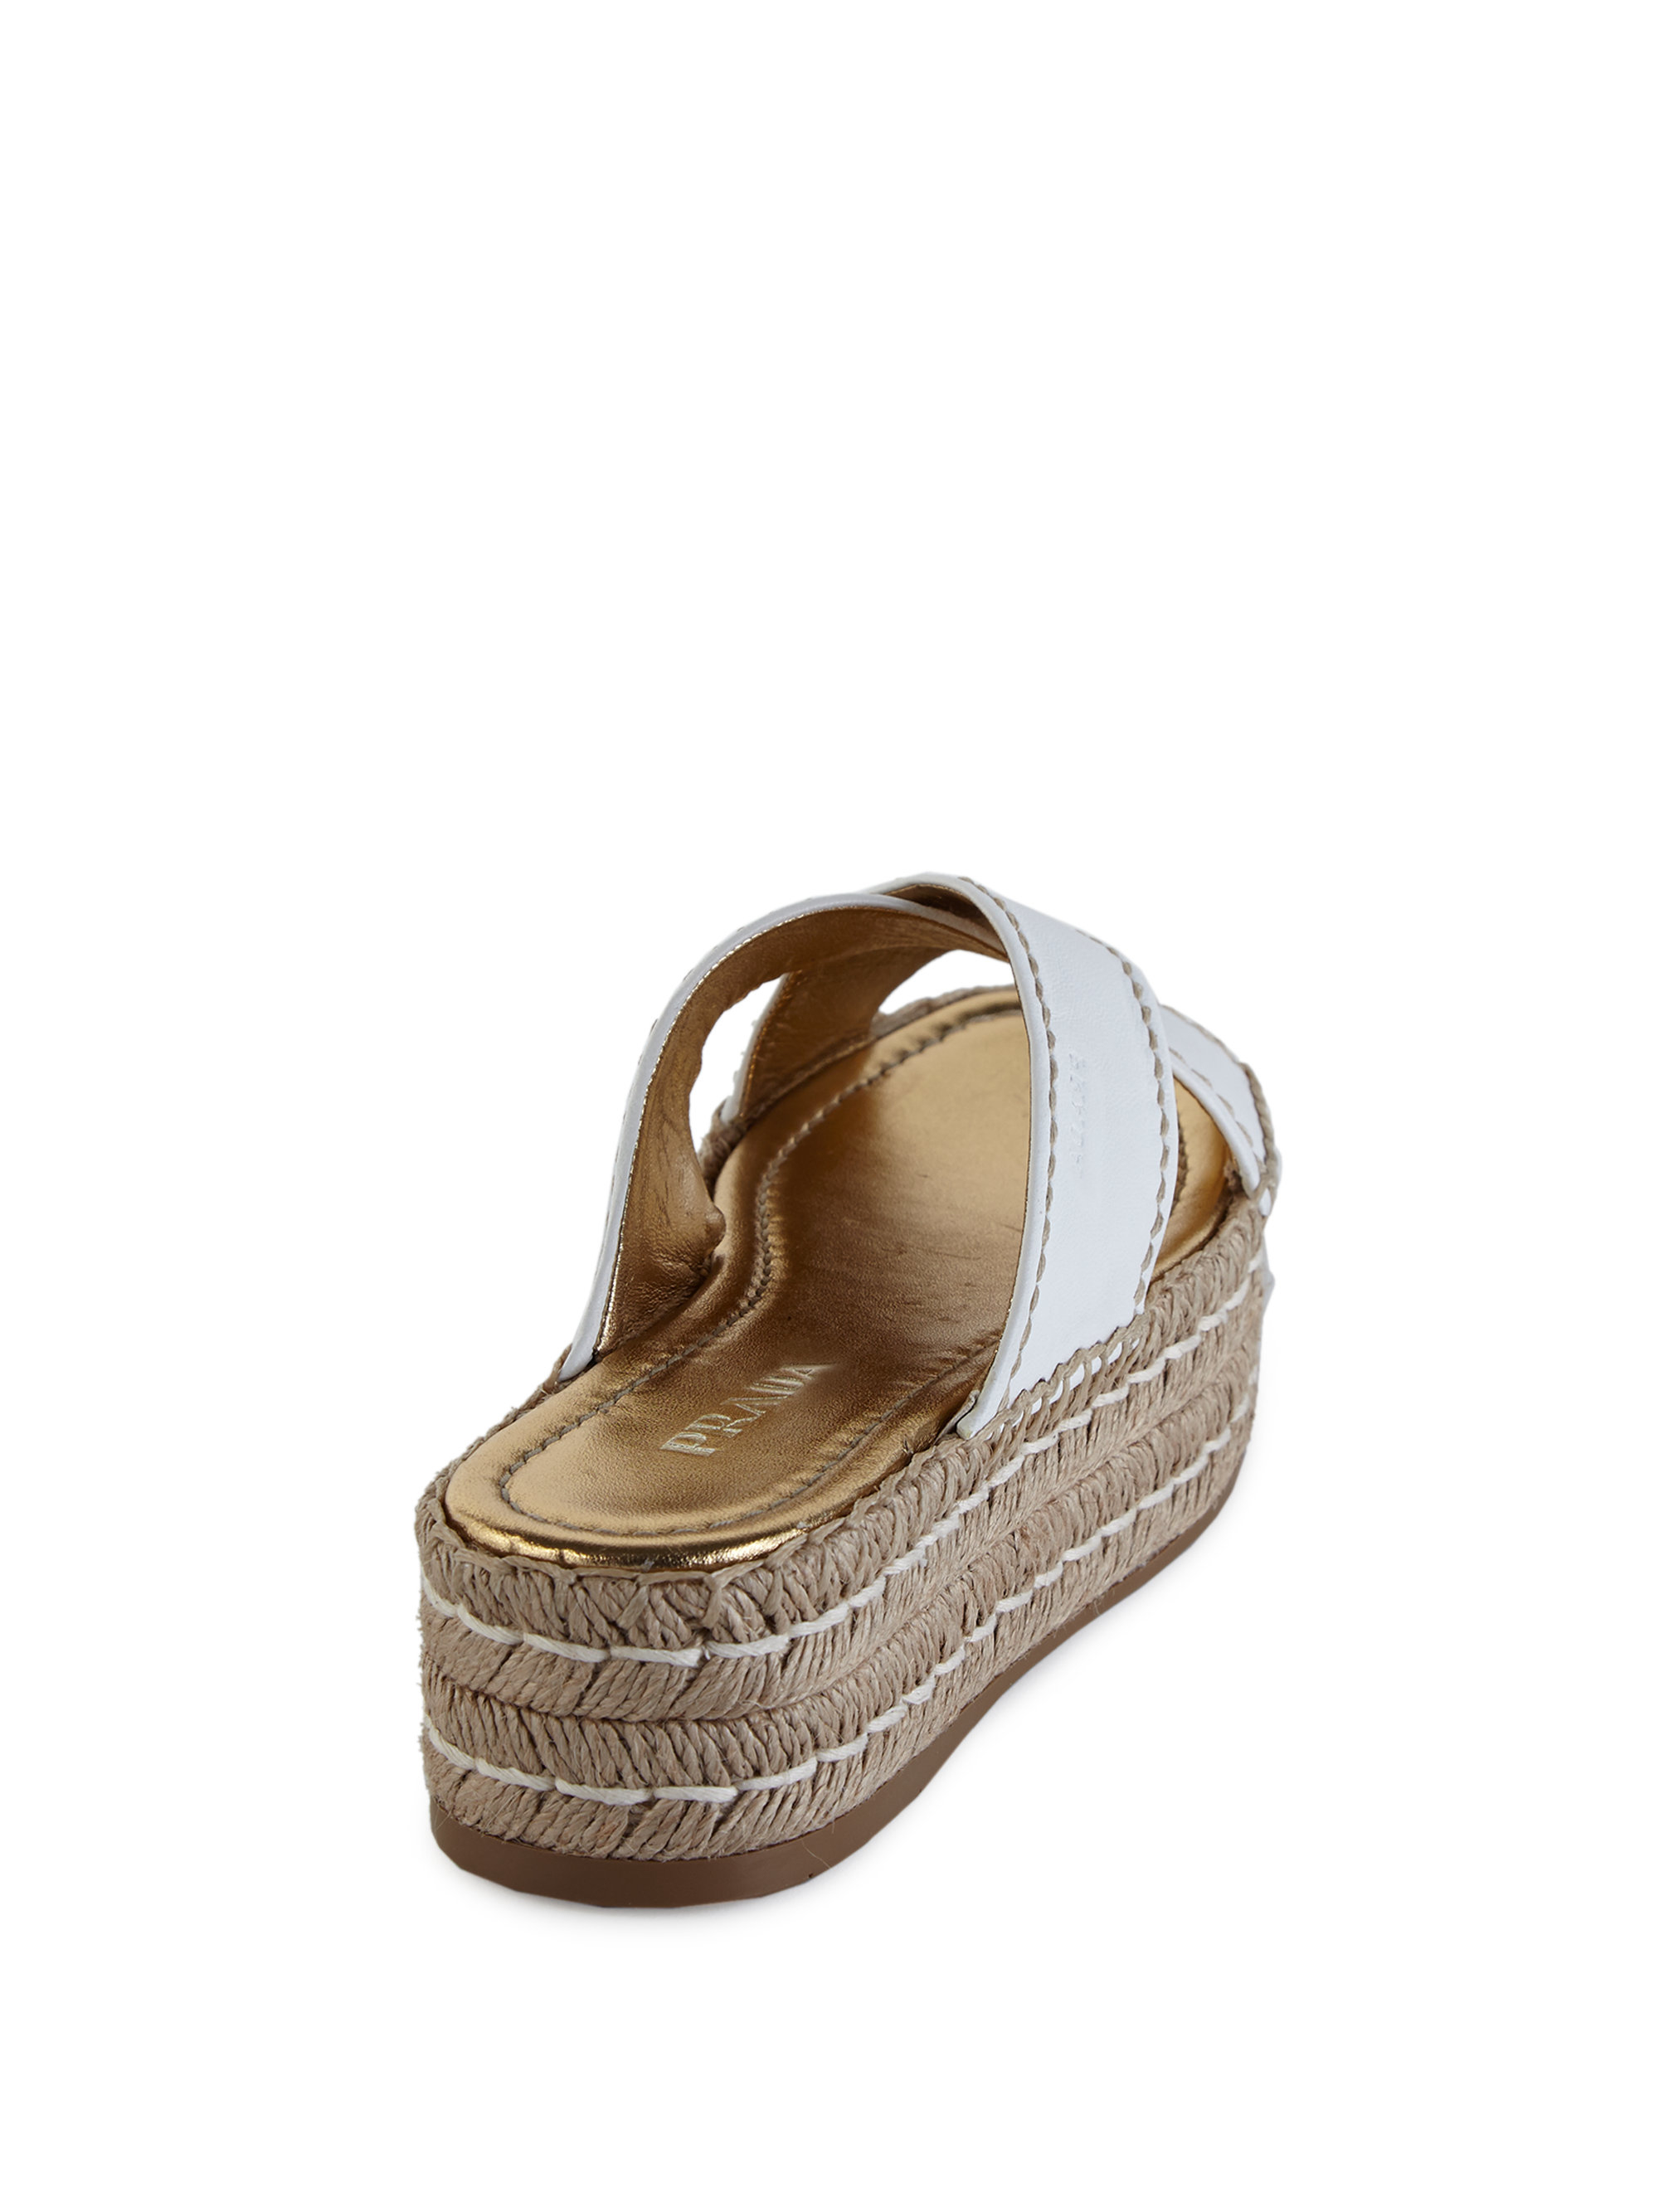 prada pouch sale - Prada Leather Double Platform Espadrille Slide Sandals in Natural ...